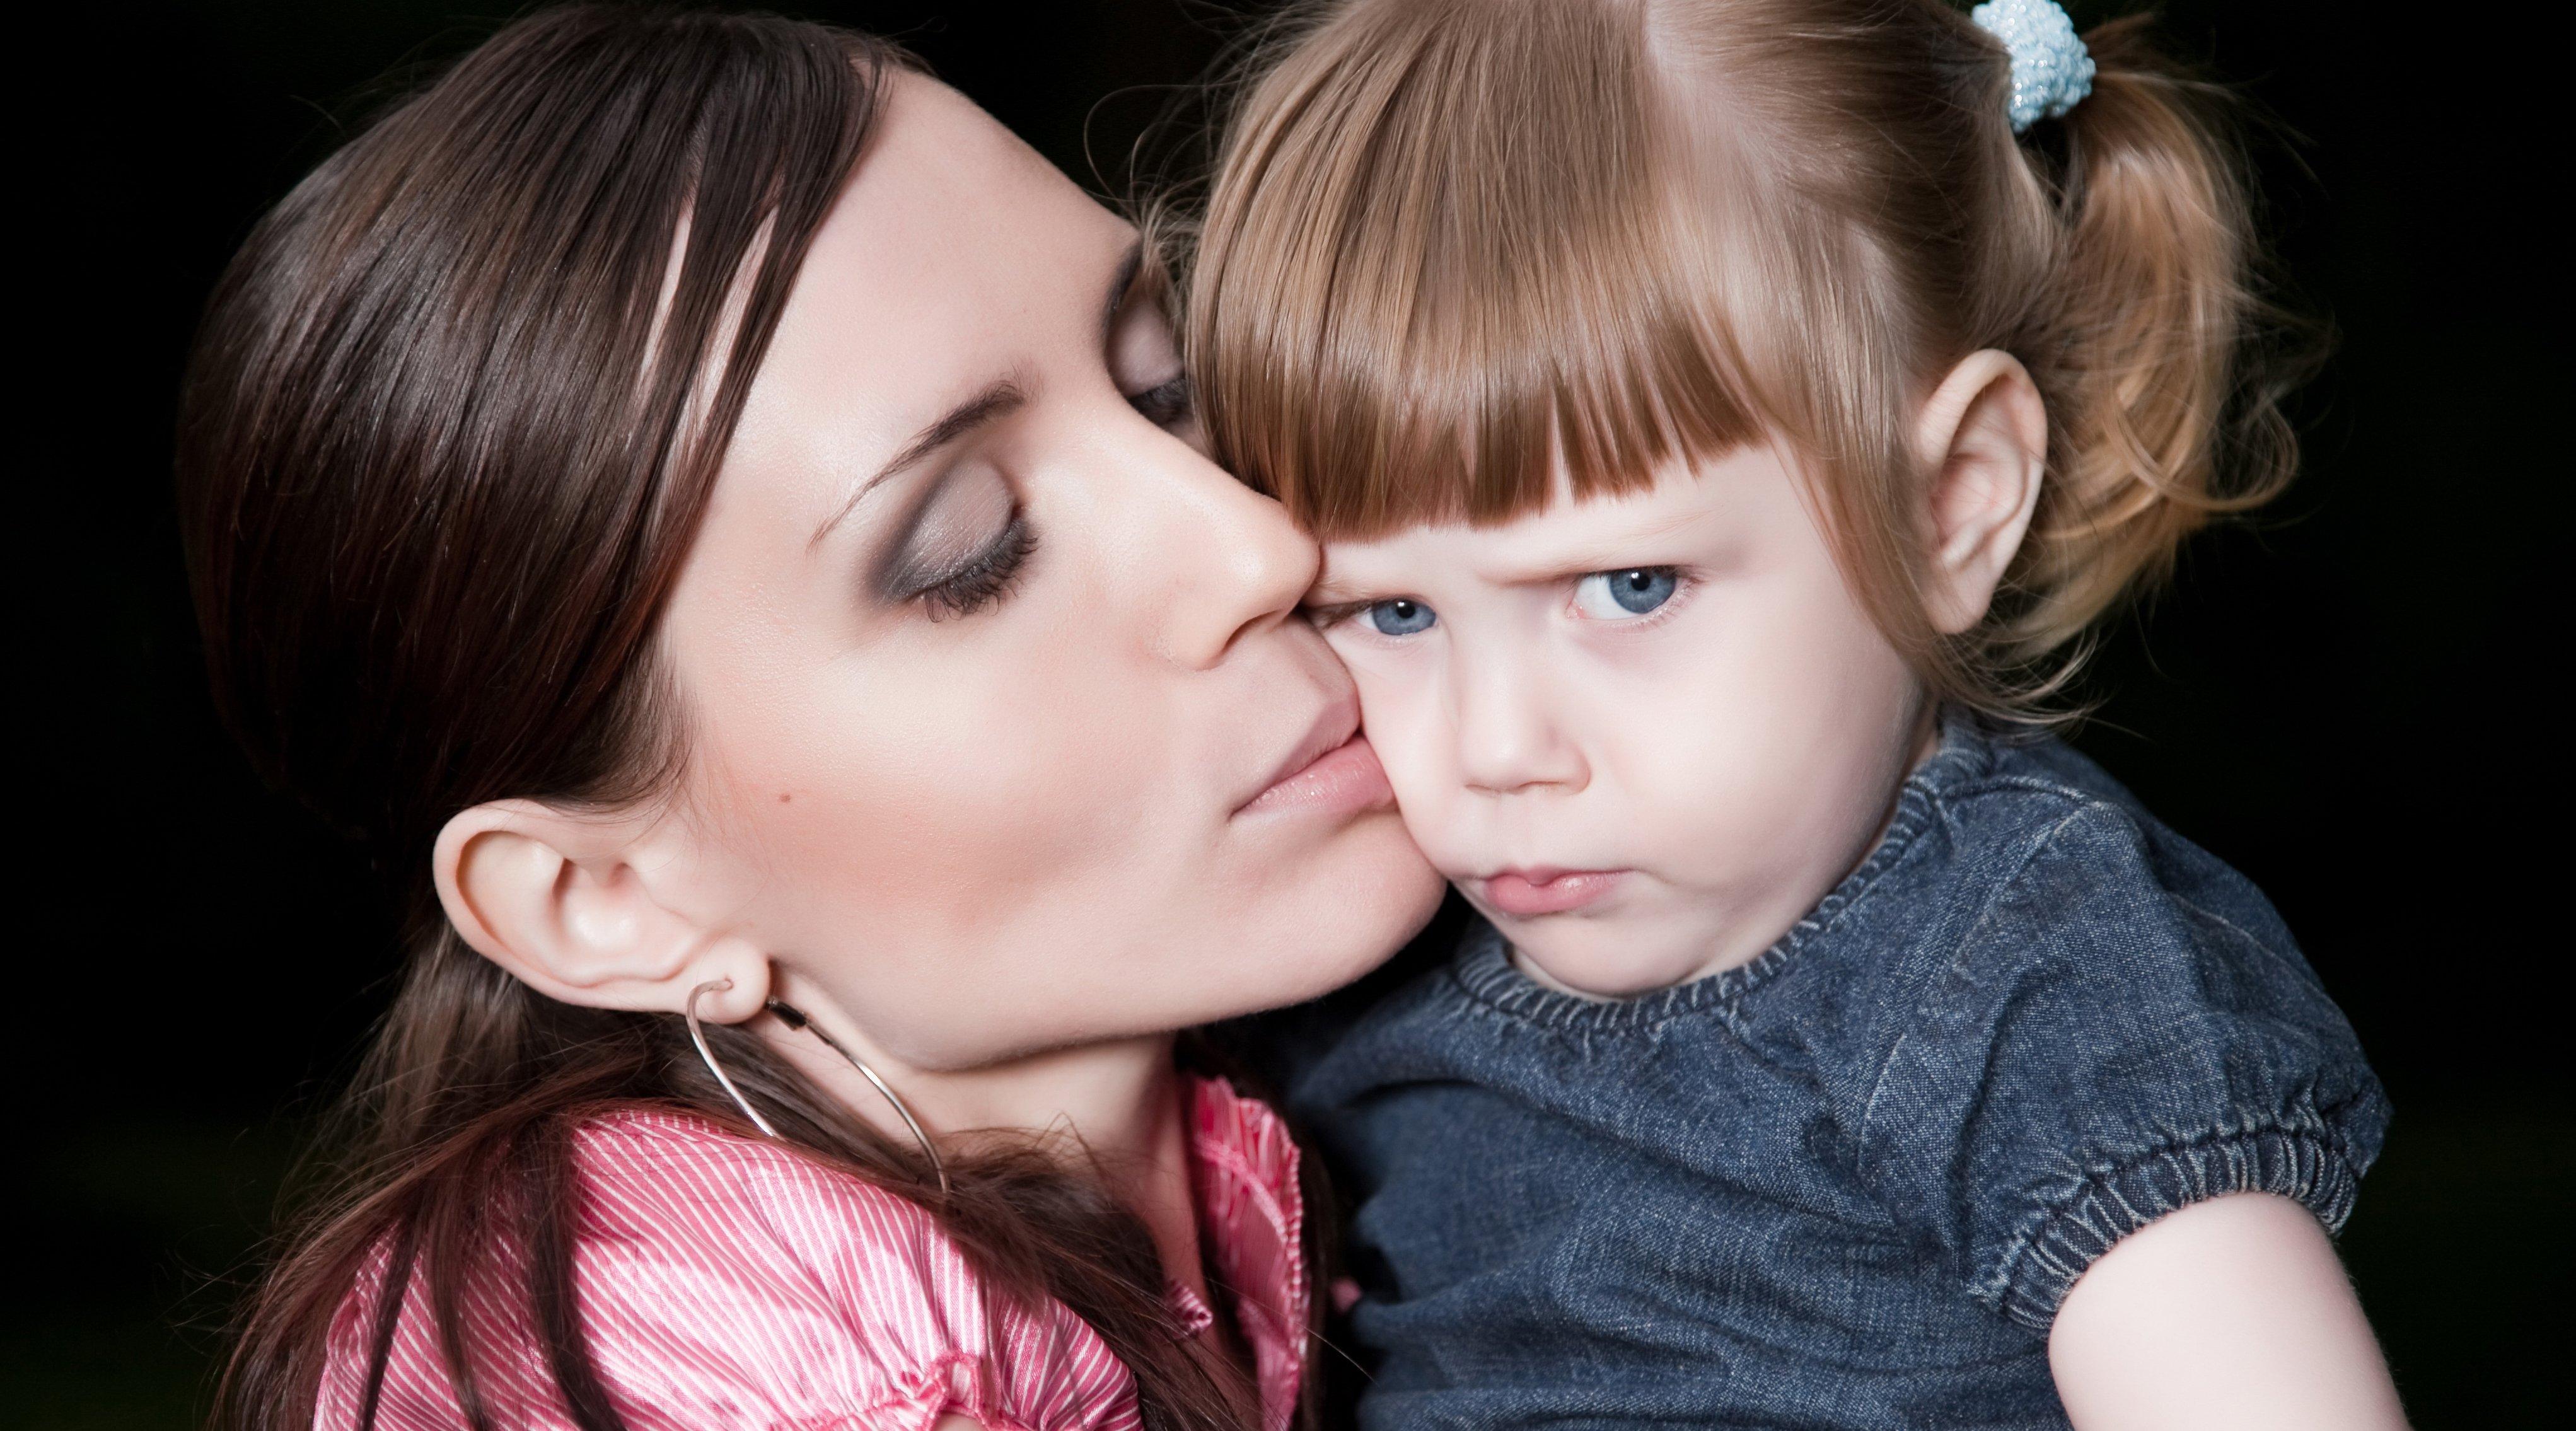 Мама целует дочь